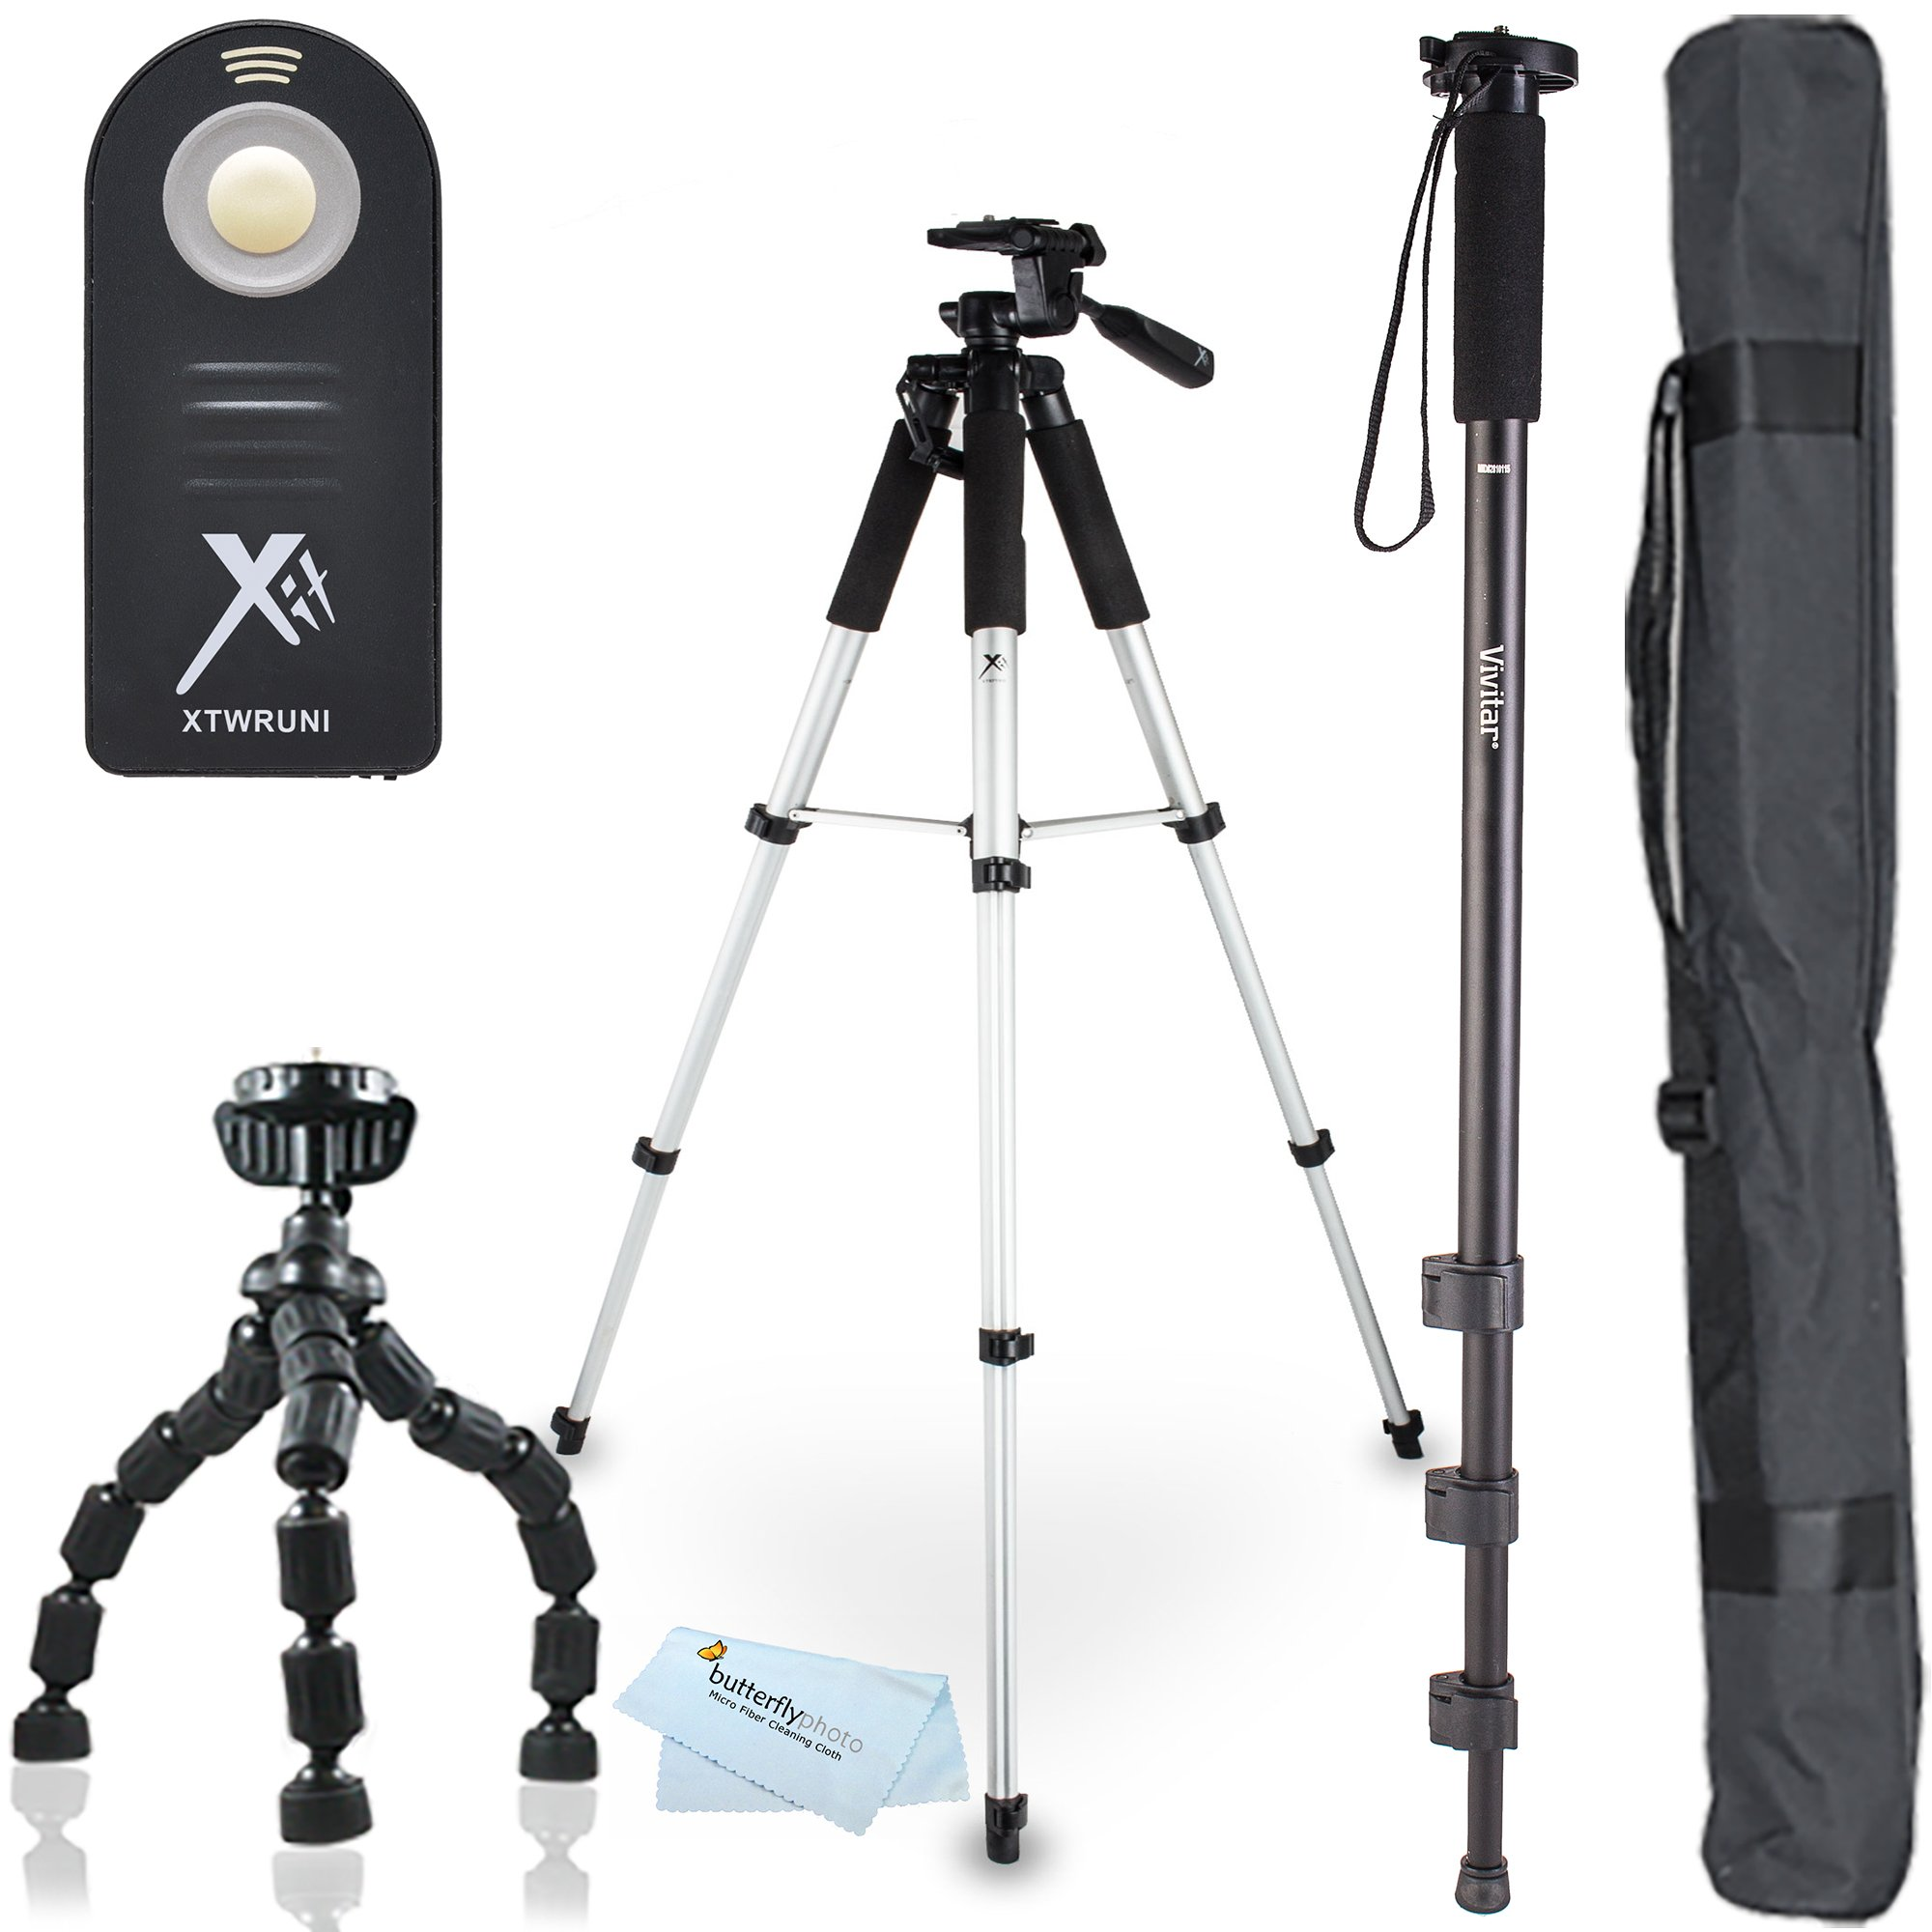 Triple Tripod Kit + RC-6 Wireless Shutter Release Remote Control For Canon EOS Rebel T5i, T4i, T3i, 5D, 7D, 7D Mark II, 6D, 60D, 70D DSLR Includes 57'' Full Tripod + 67'' Monopod + 10'' Flexible Tripod by ButterflyPhoto